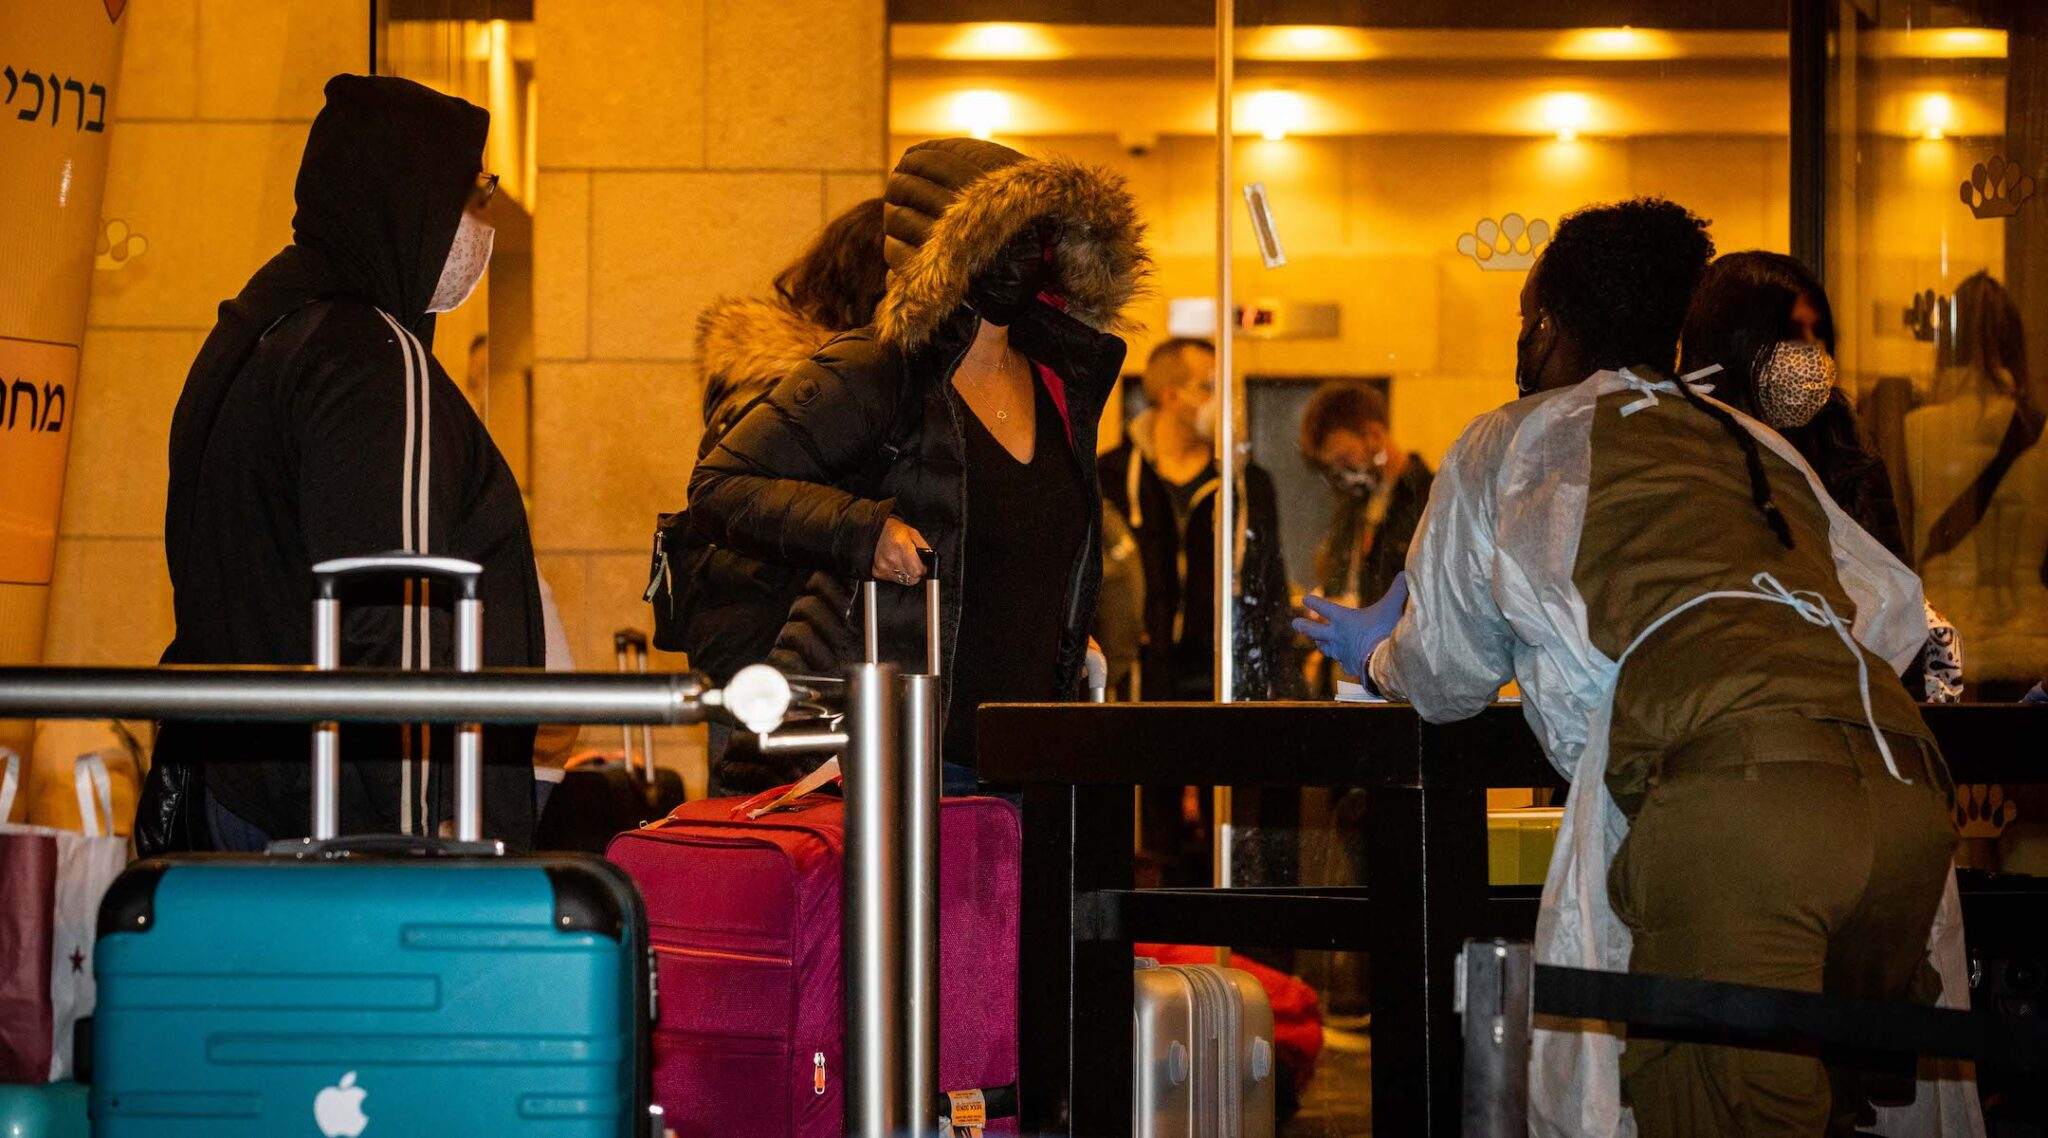 Israelis returning from England arrive at the Dan Panorama Hotel in Tel Aviv to quarantine, Dec. 20, 2020. (Photo/JTA-Yonatan Sindel-Flash90)